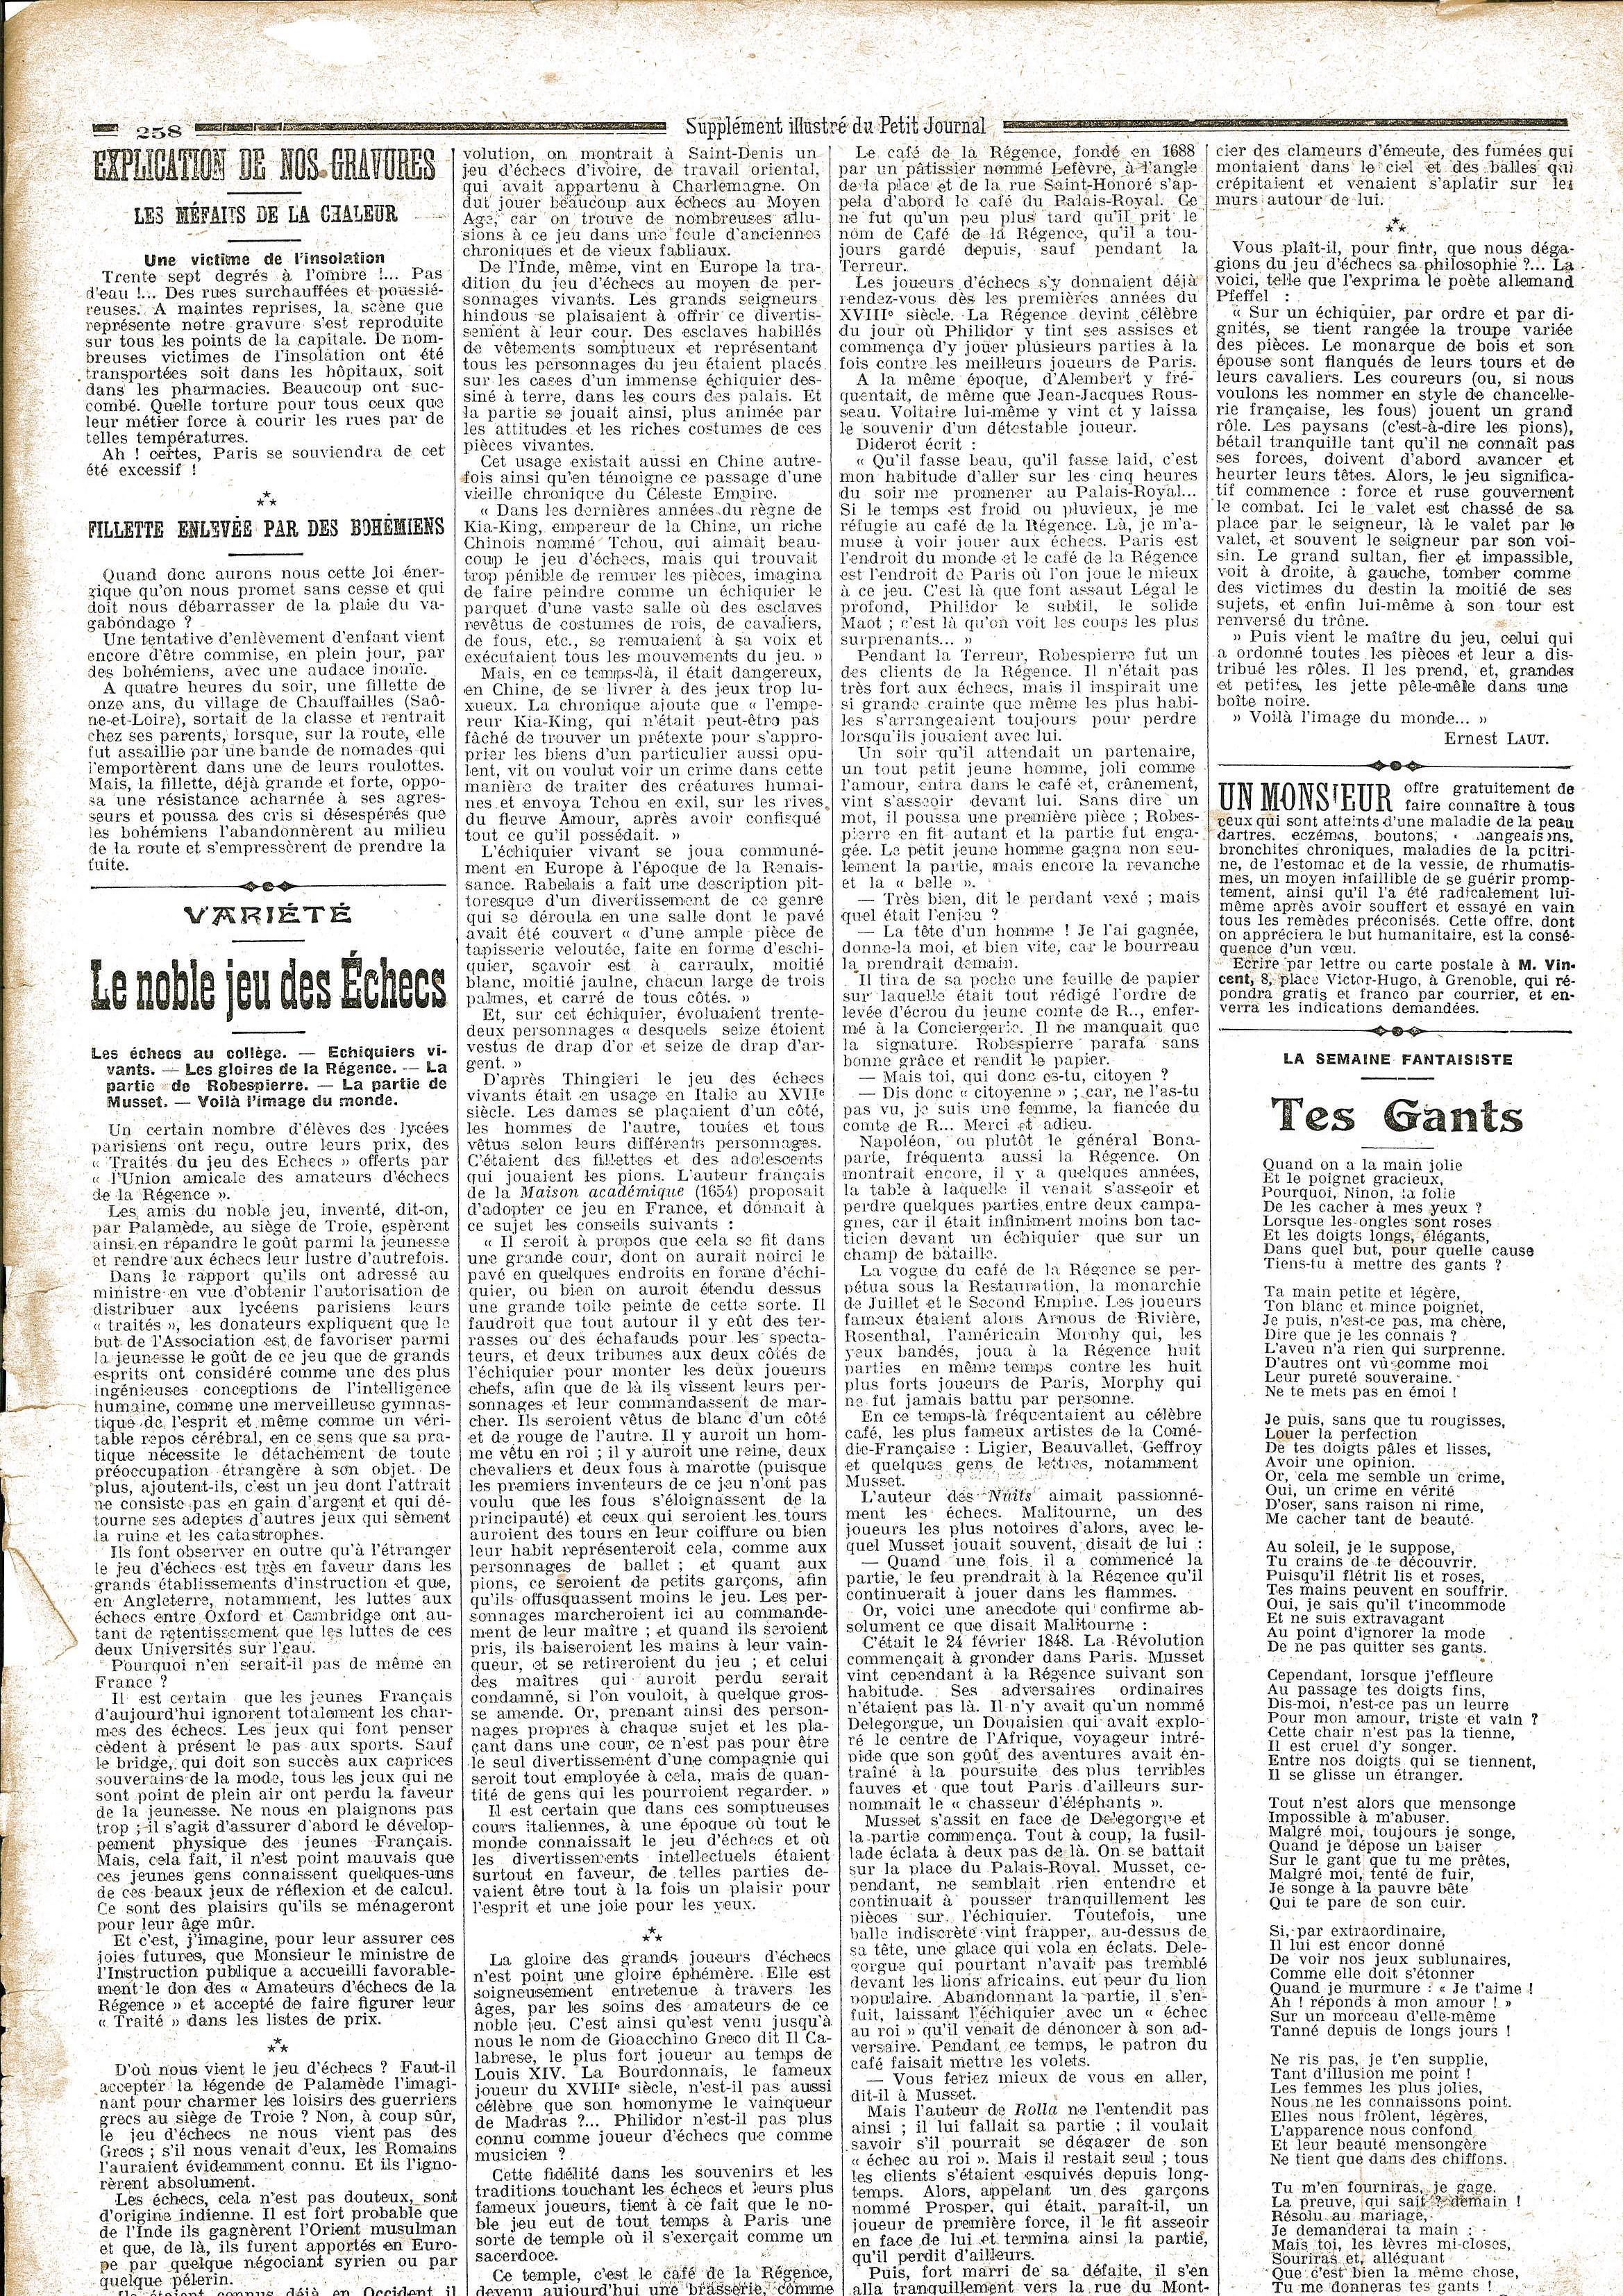 p.258.jpg - image/jpeg